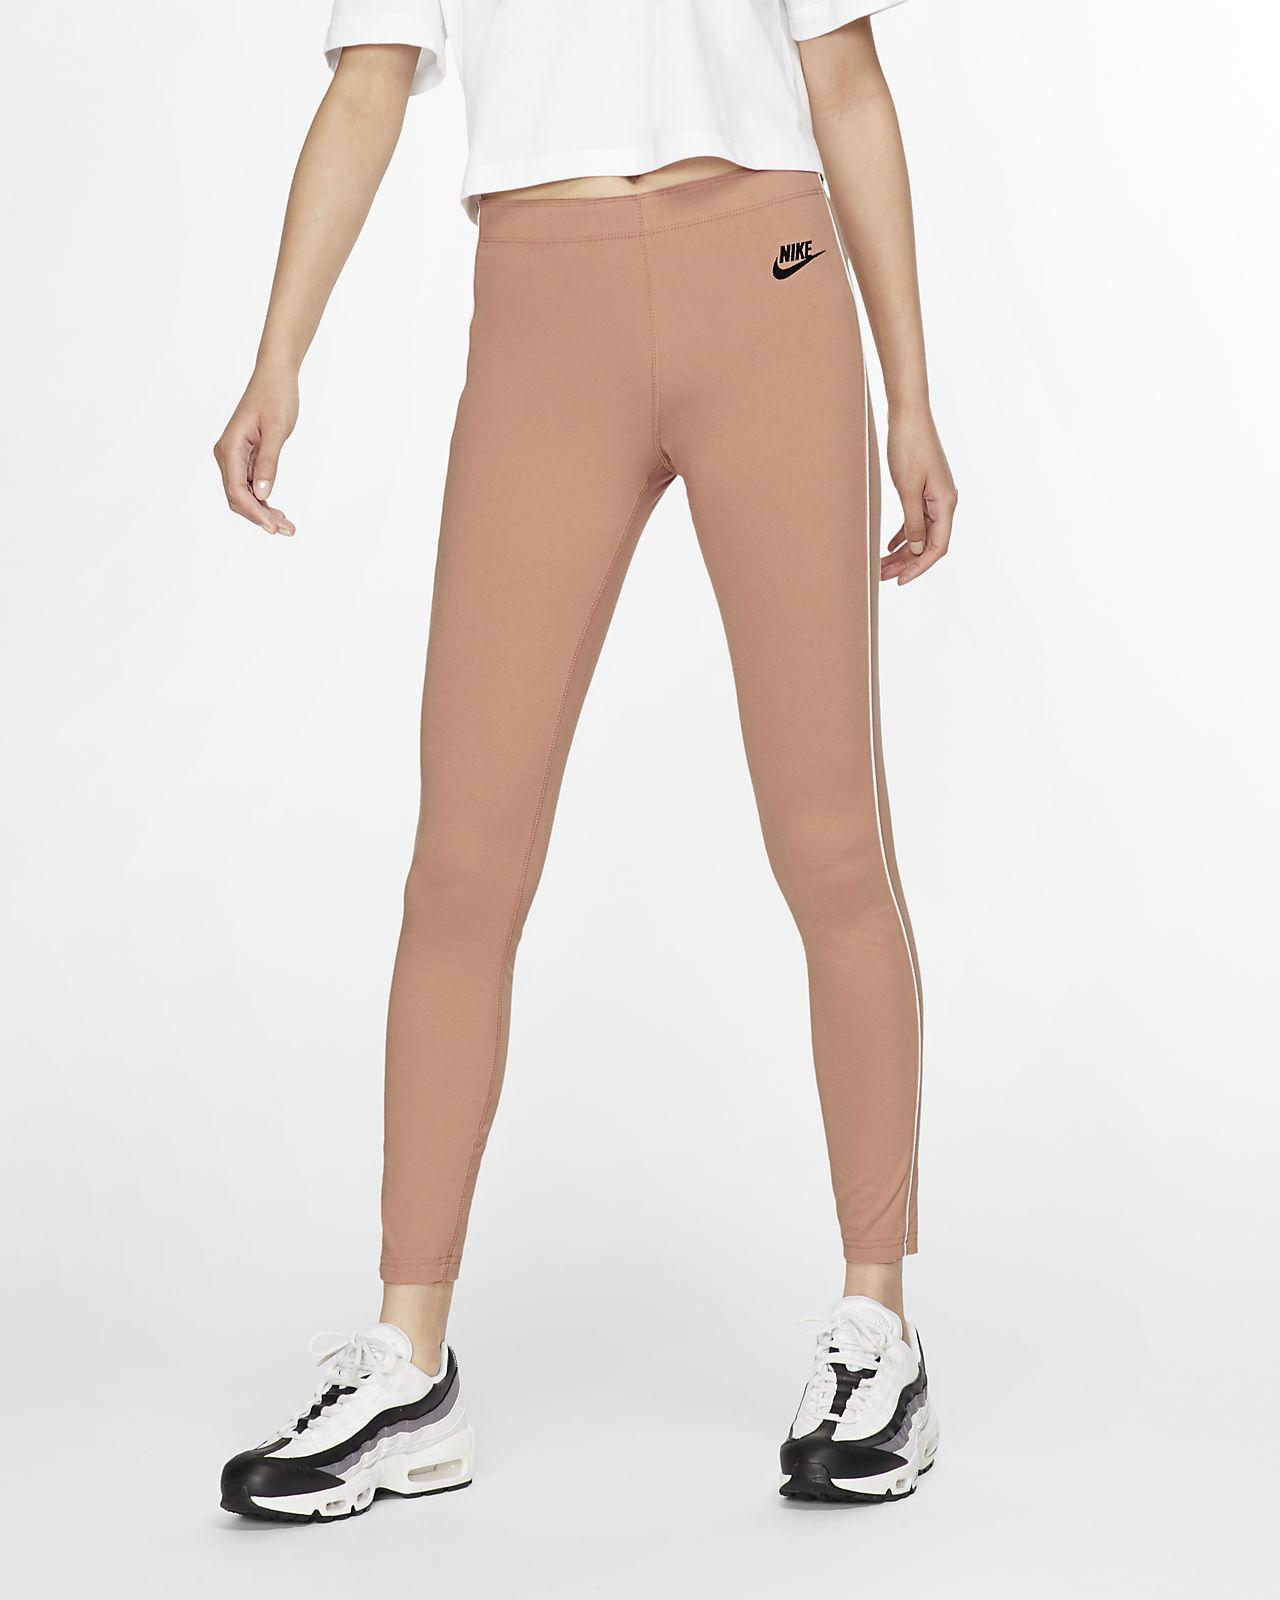 Leggings Nike Sportswear para mulher